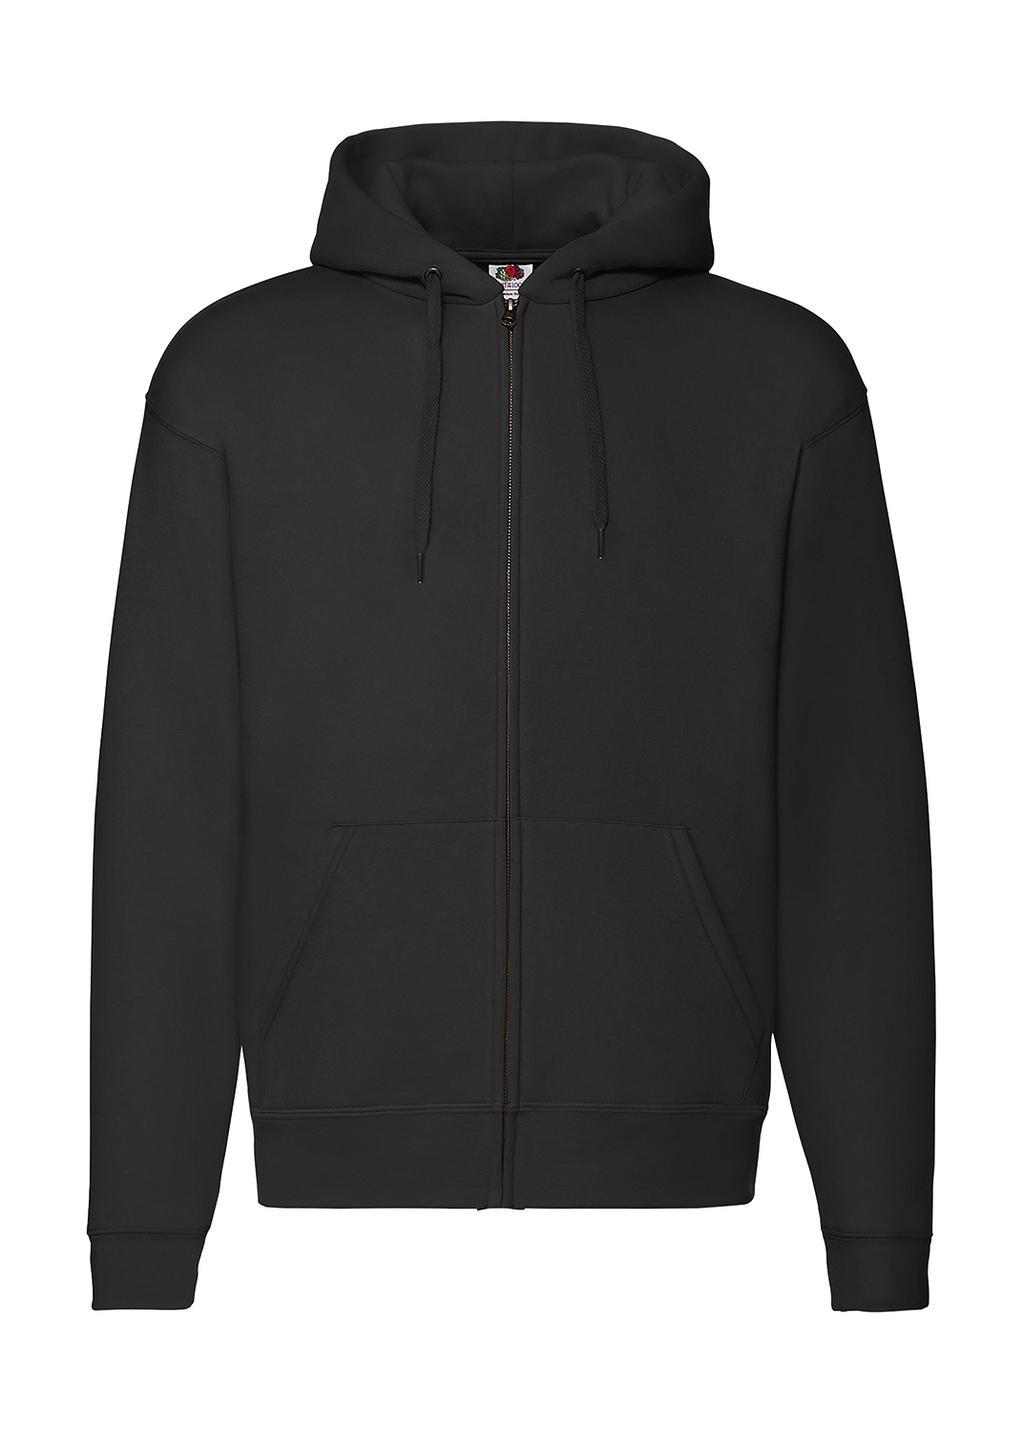 Mikina s kapucí a zipem Premium - zvìtšit obrázek